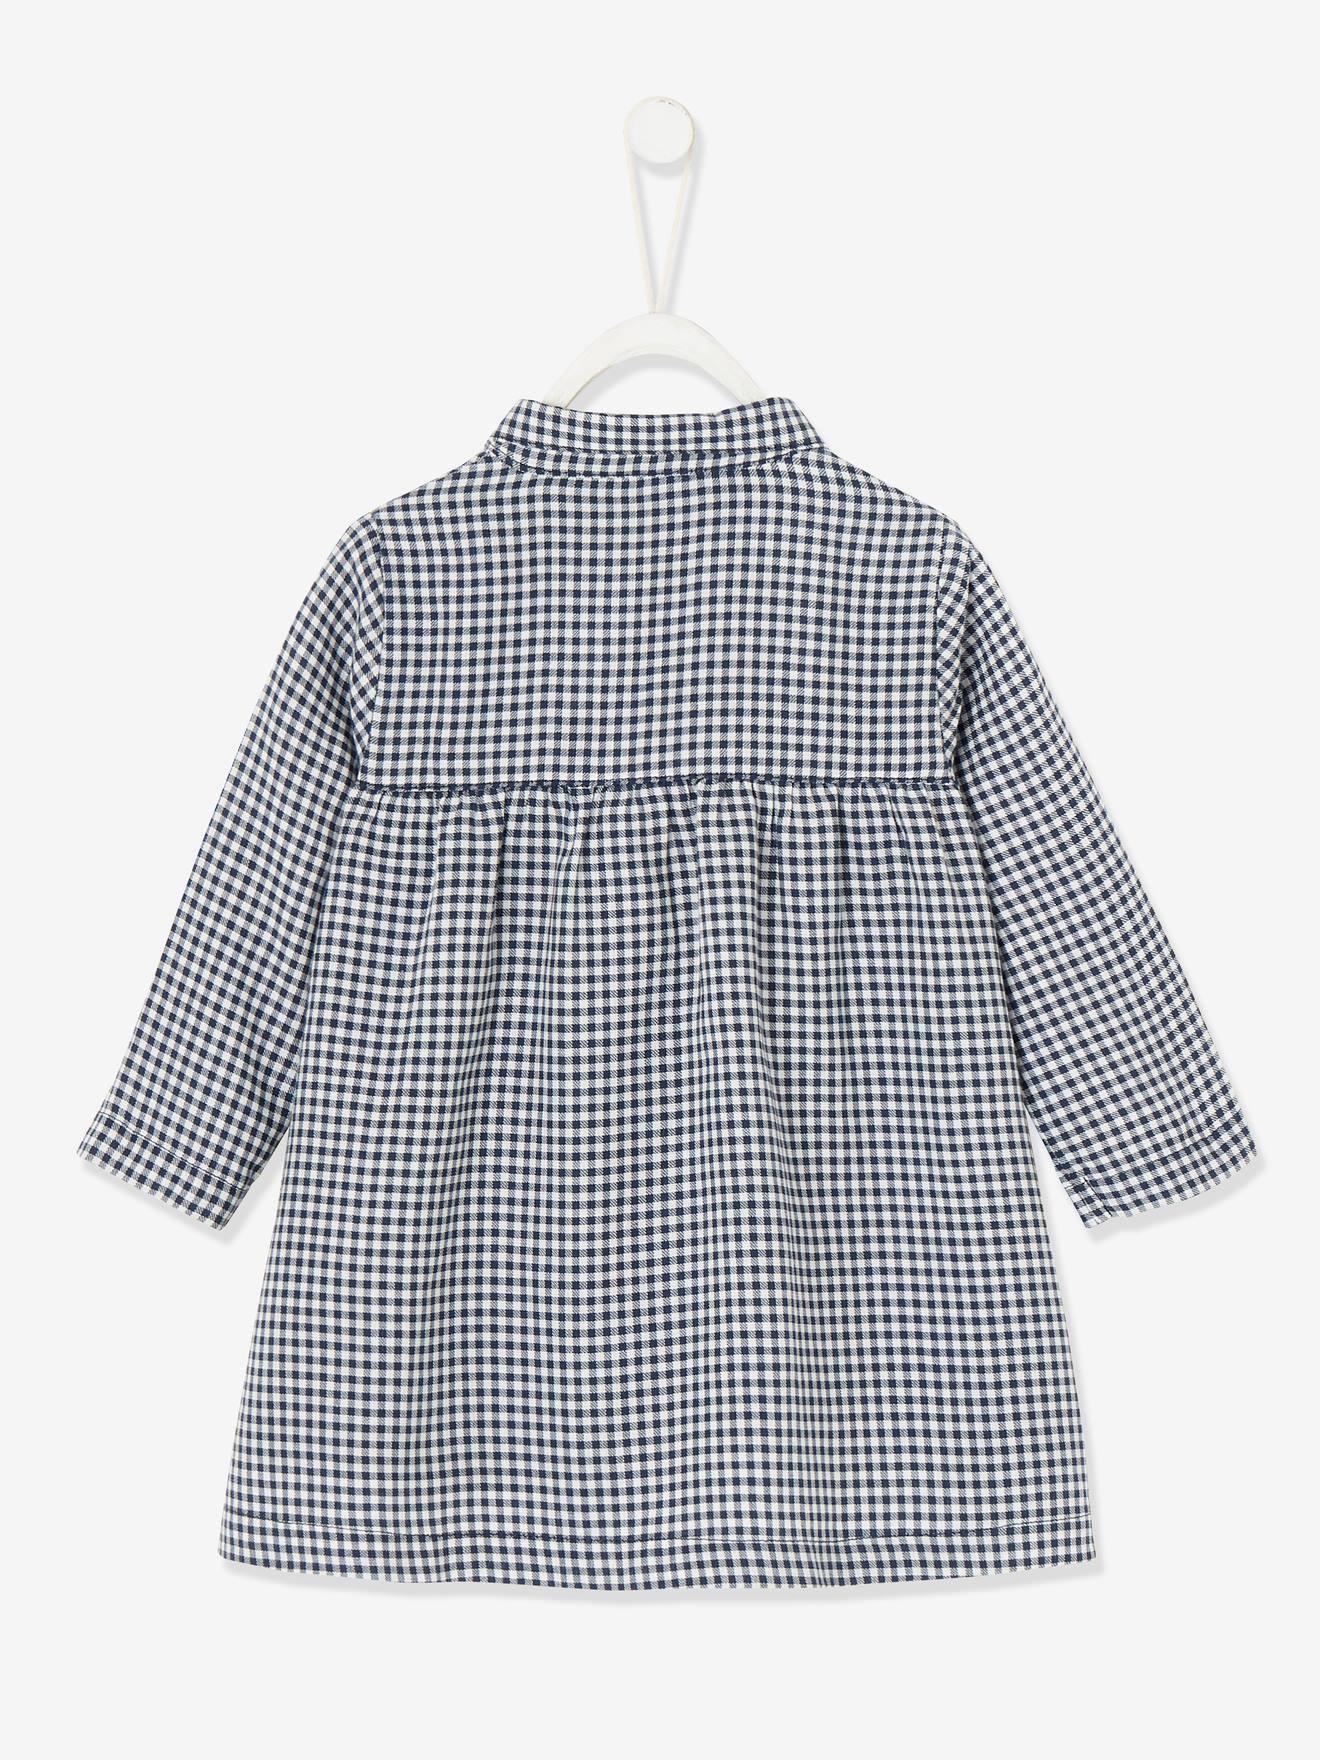 Robe Vichy Bebe Fille Carreaux Bleu Indio Bebe